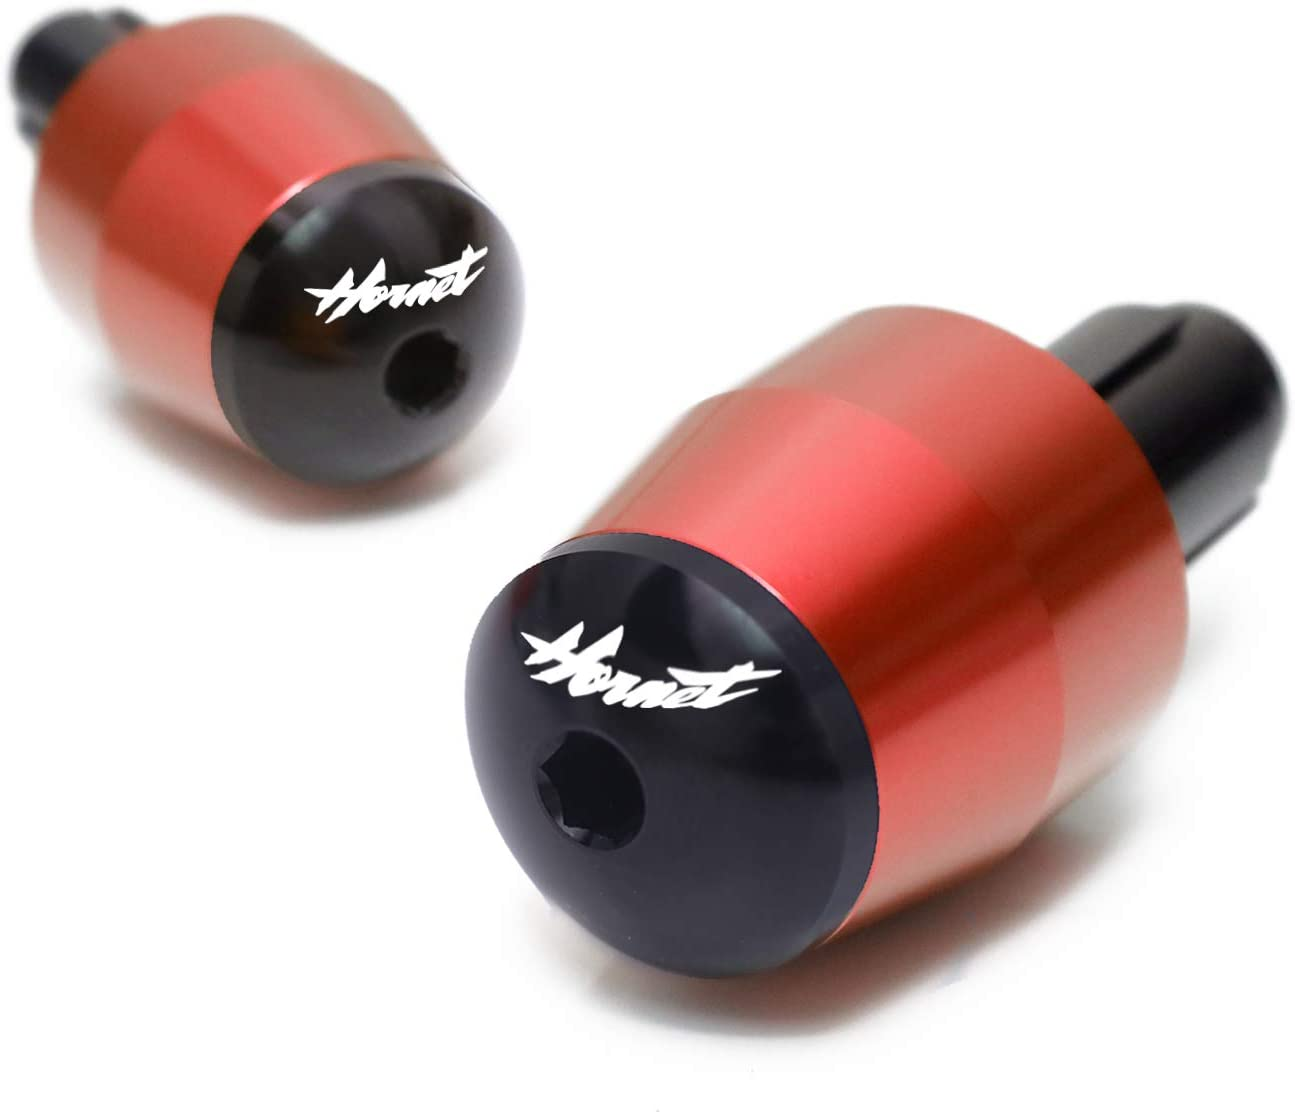 MC MOTOPARTS Black Billet CNC Handle bars LIM Bar Ends For Honda CBR600RR 03-17 15 CBR1000RR 04-18 16 17 CBR600F 11-14